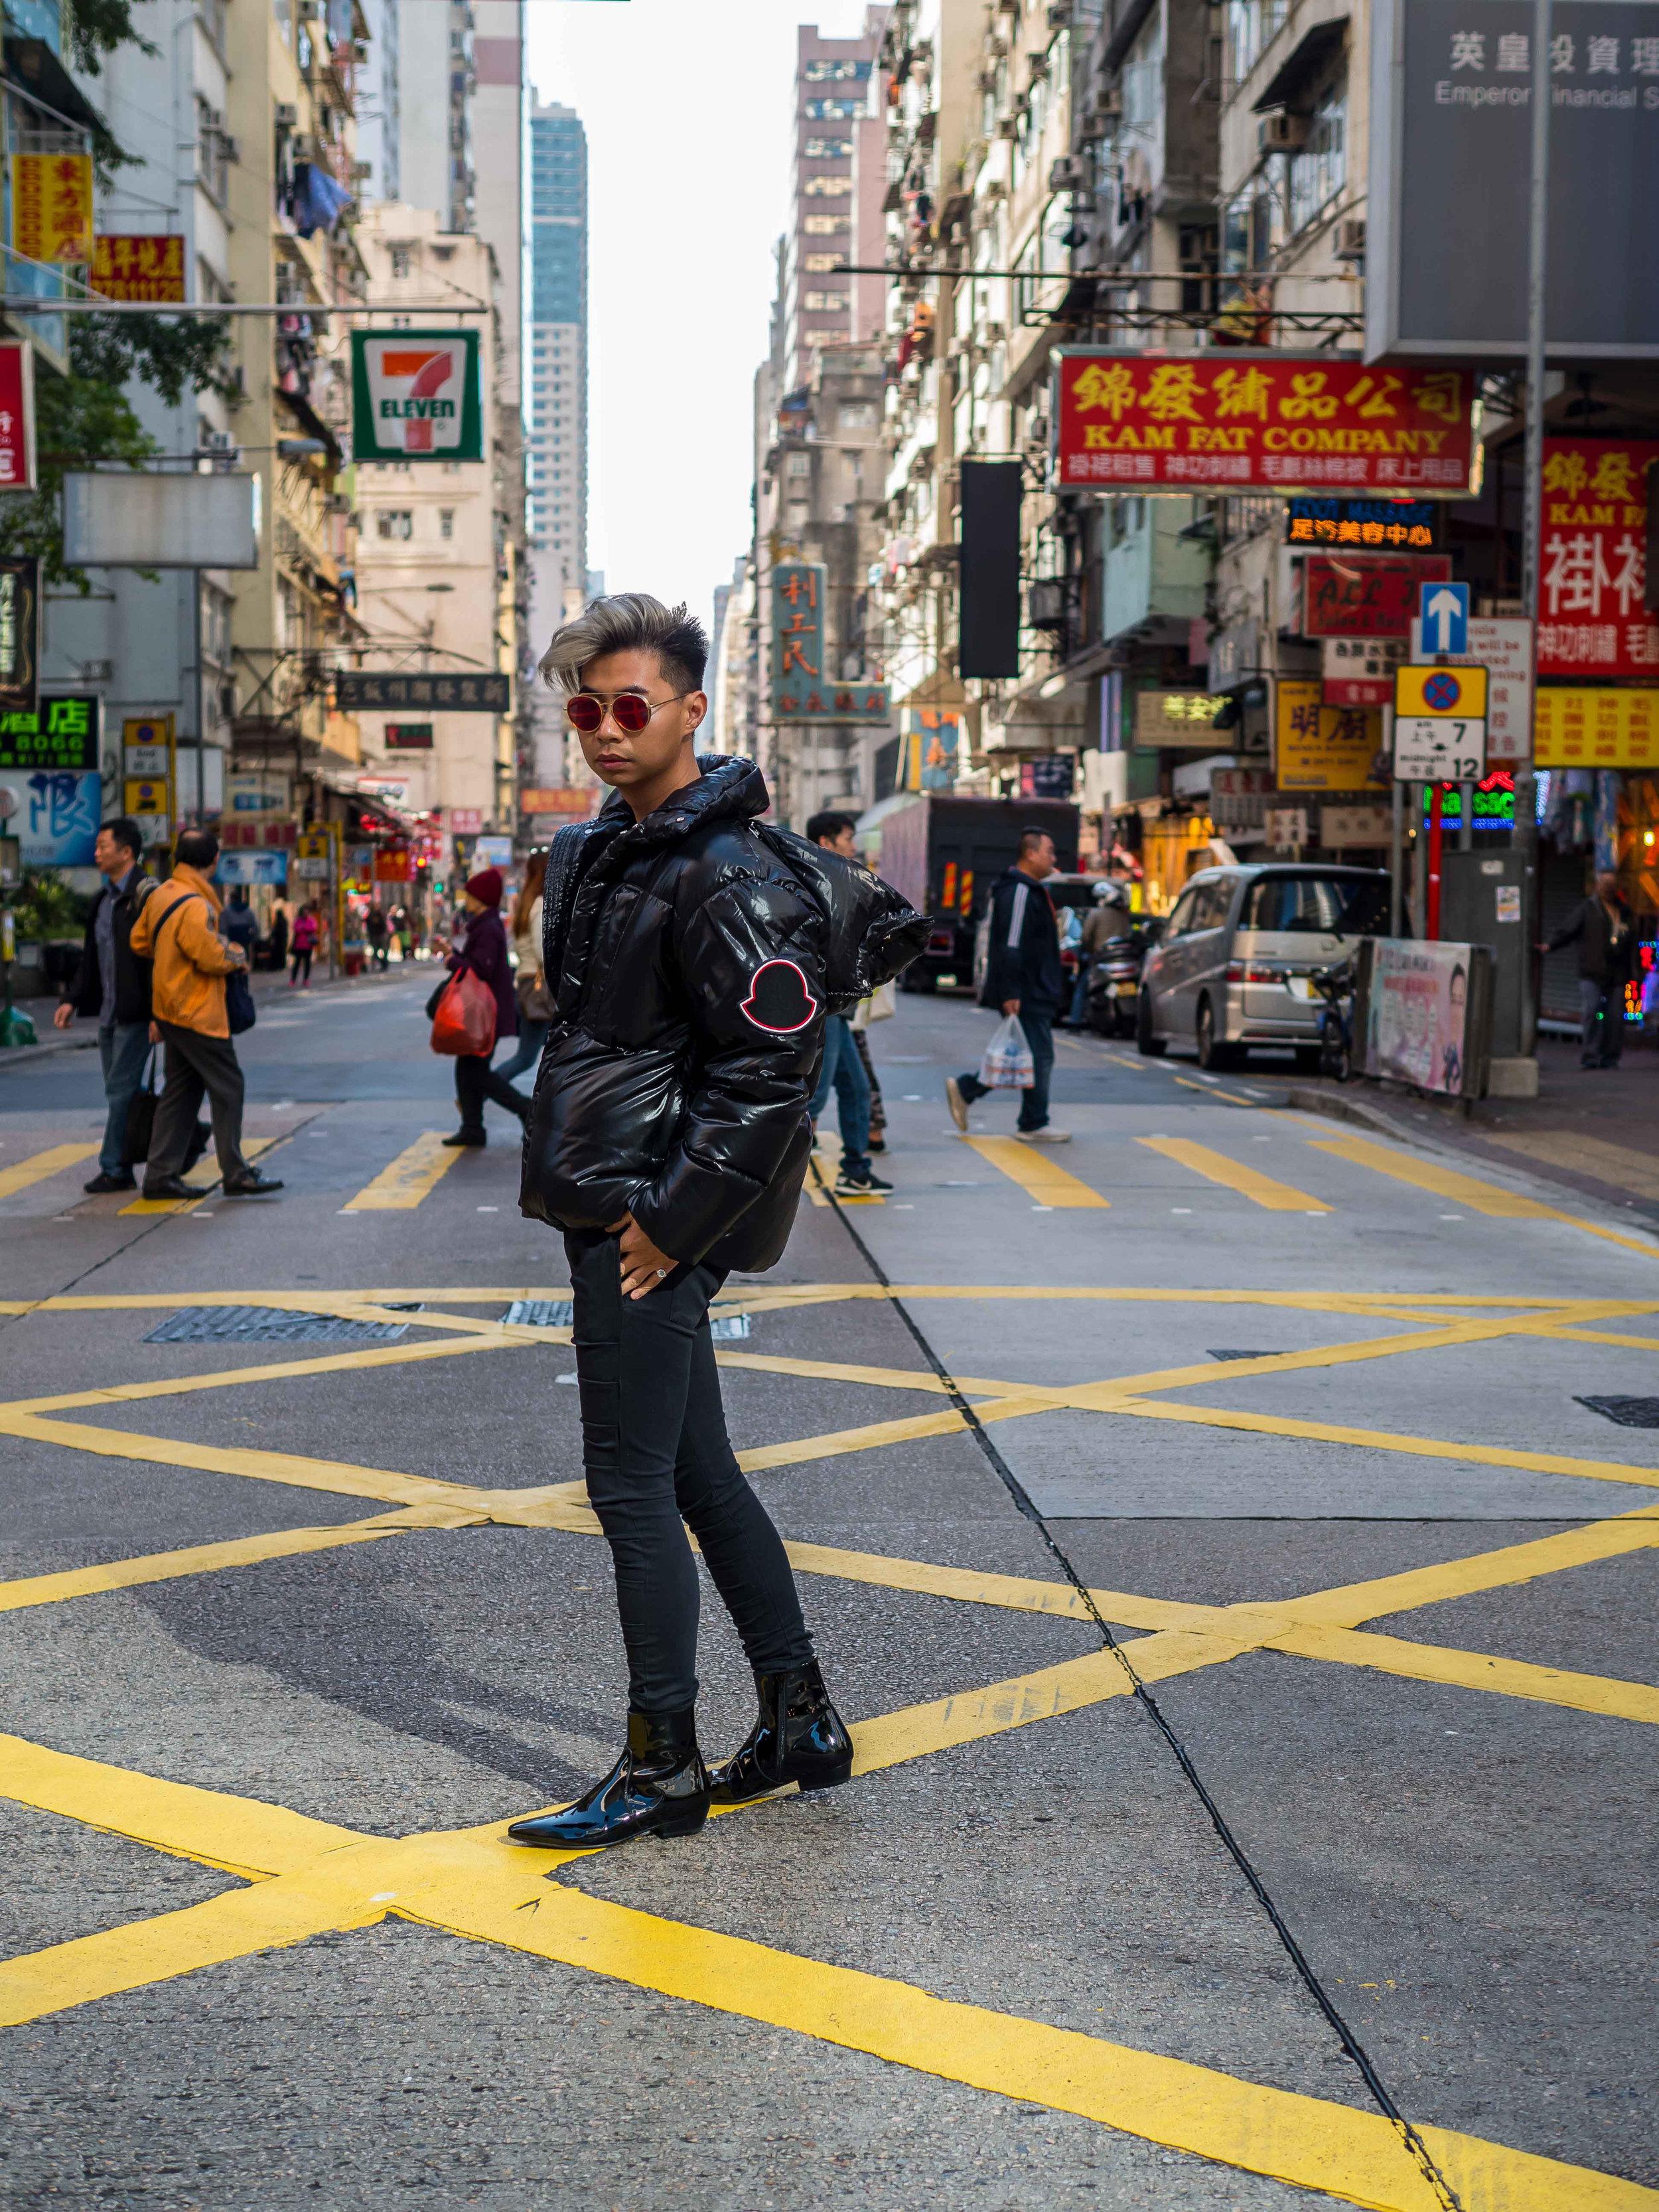 MYBELONGING-TOMMYLEI-MENSWEAR-STREETSTYLE-MONCLER-X-FARFETCH-MONGKOK-CITY-STREETS-HONGKONG-TRAVEL-PHOTOGRAPHY-14.jpg